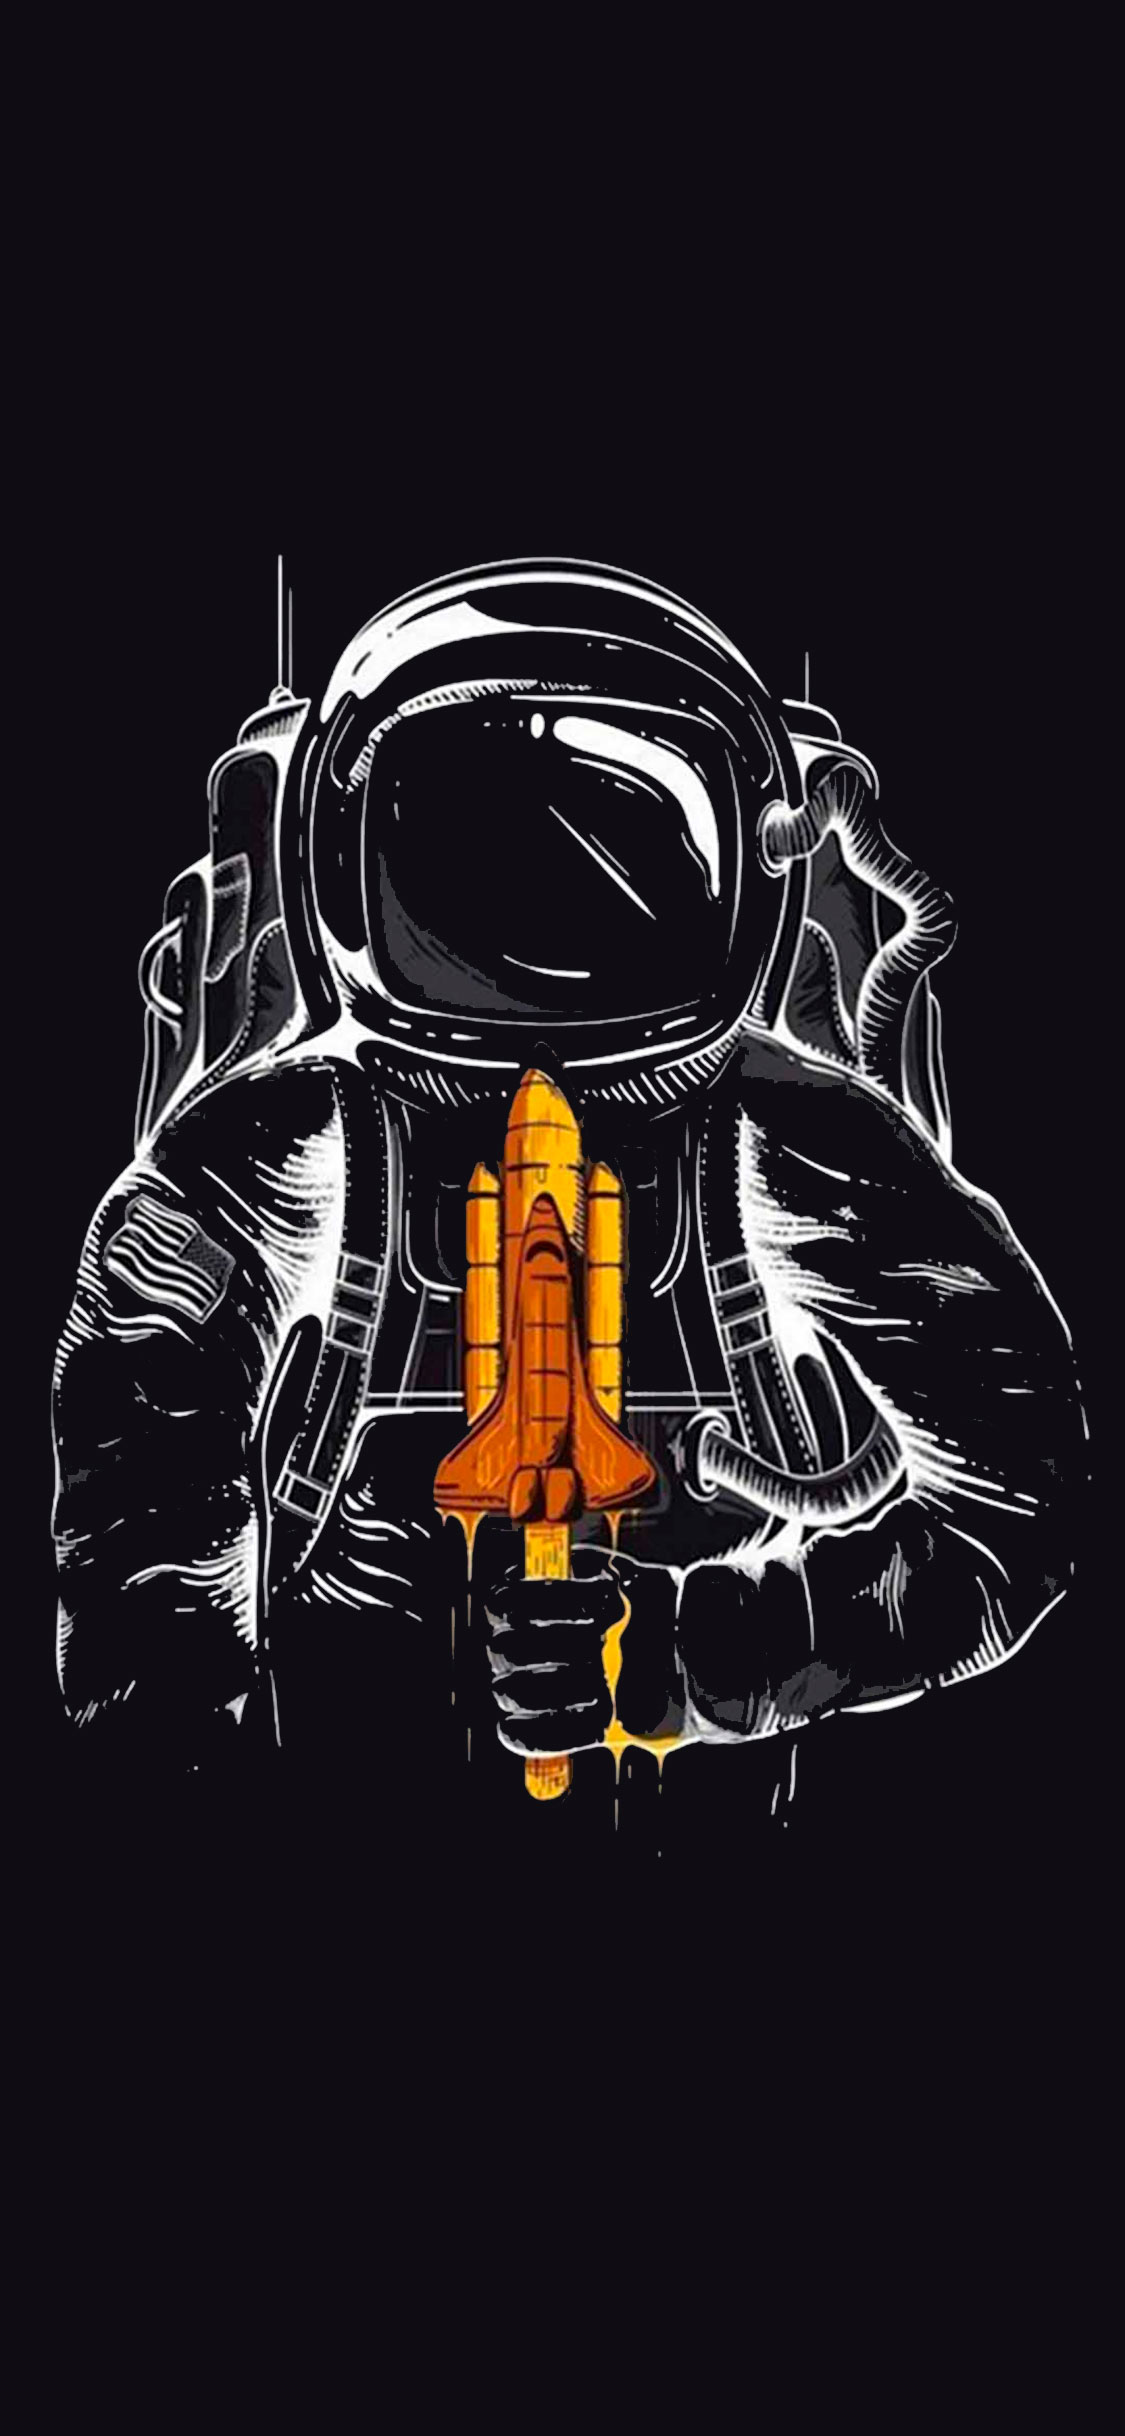 iPhone wallpaper astronaut3 Fonds d'écran iPhone du 22/05/2018